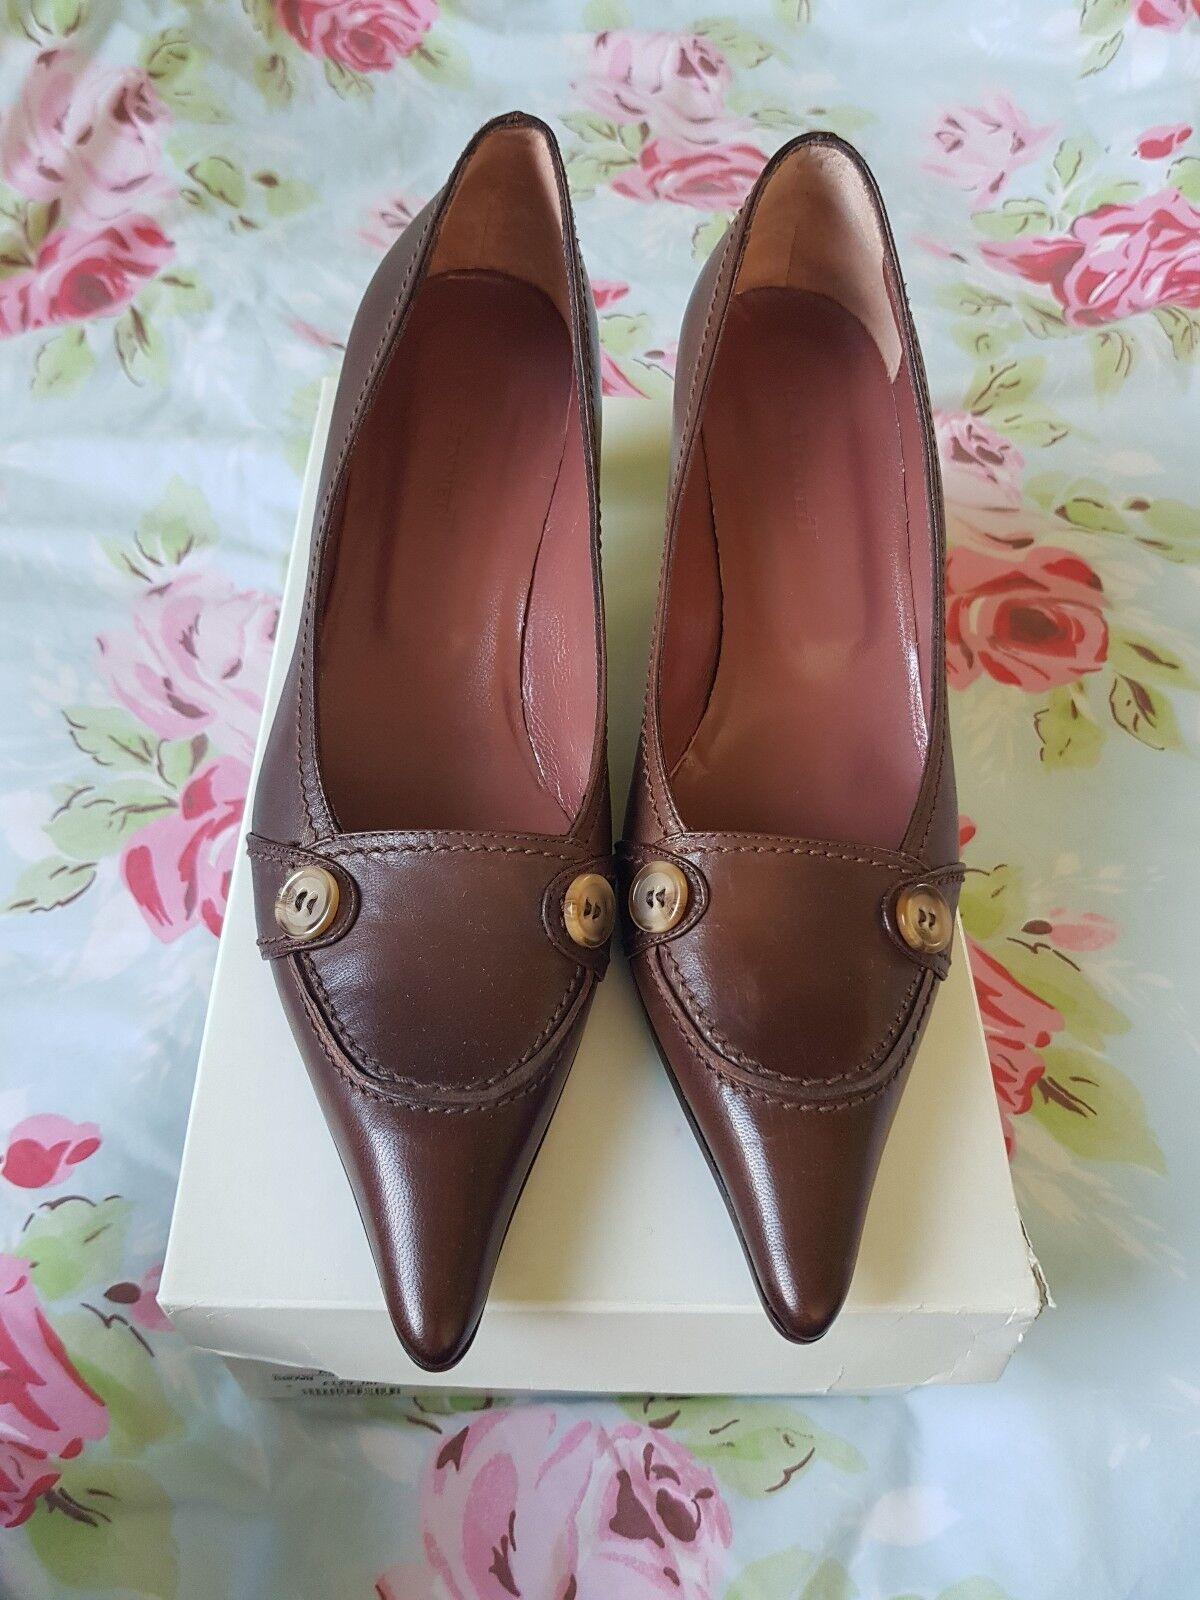 Ladies L.k.Bennett Heels Size 37 Uk 4